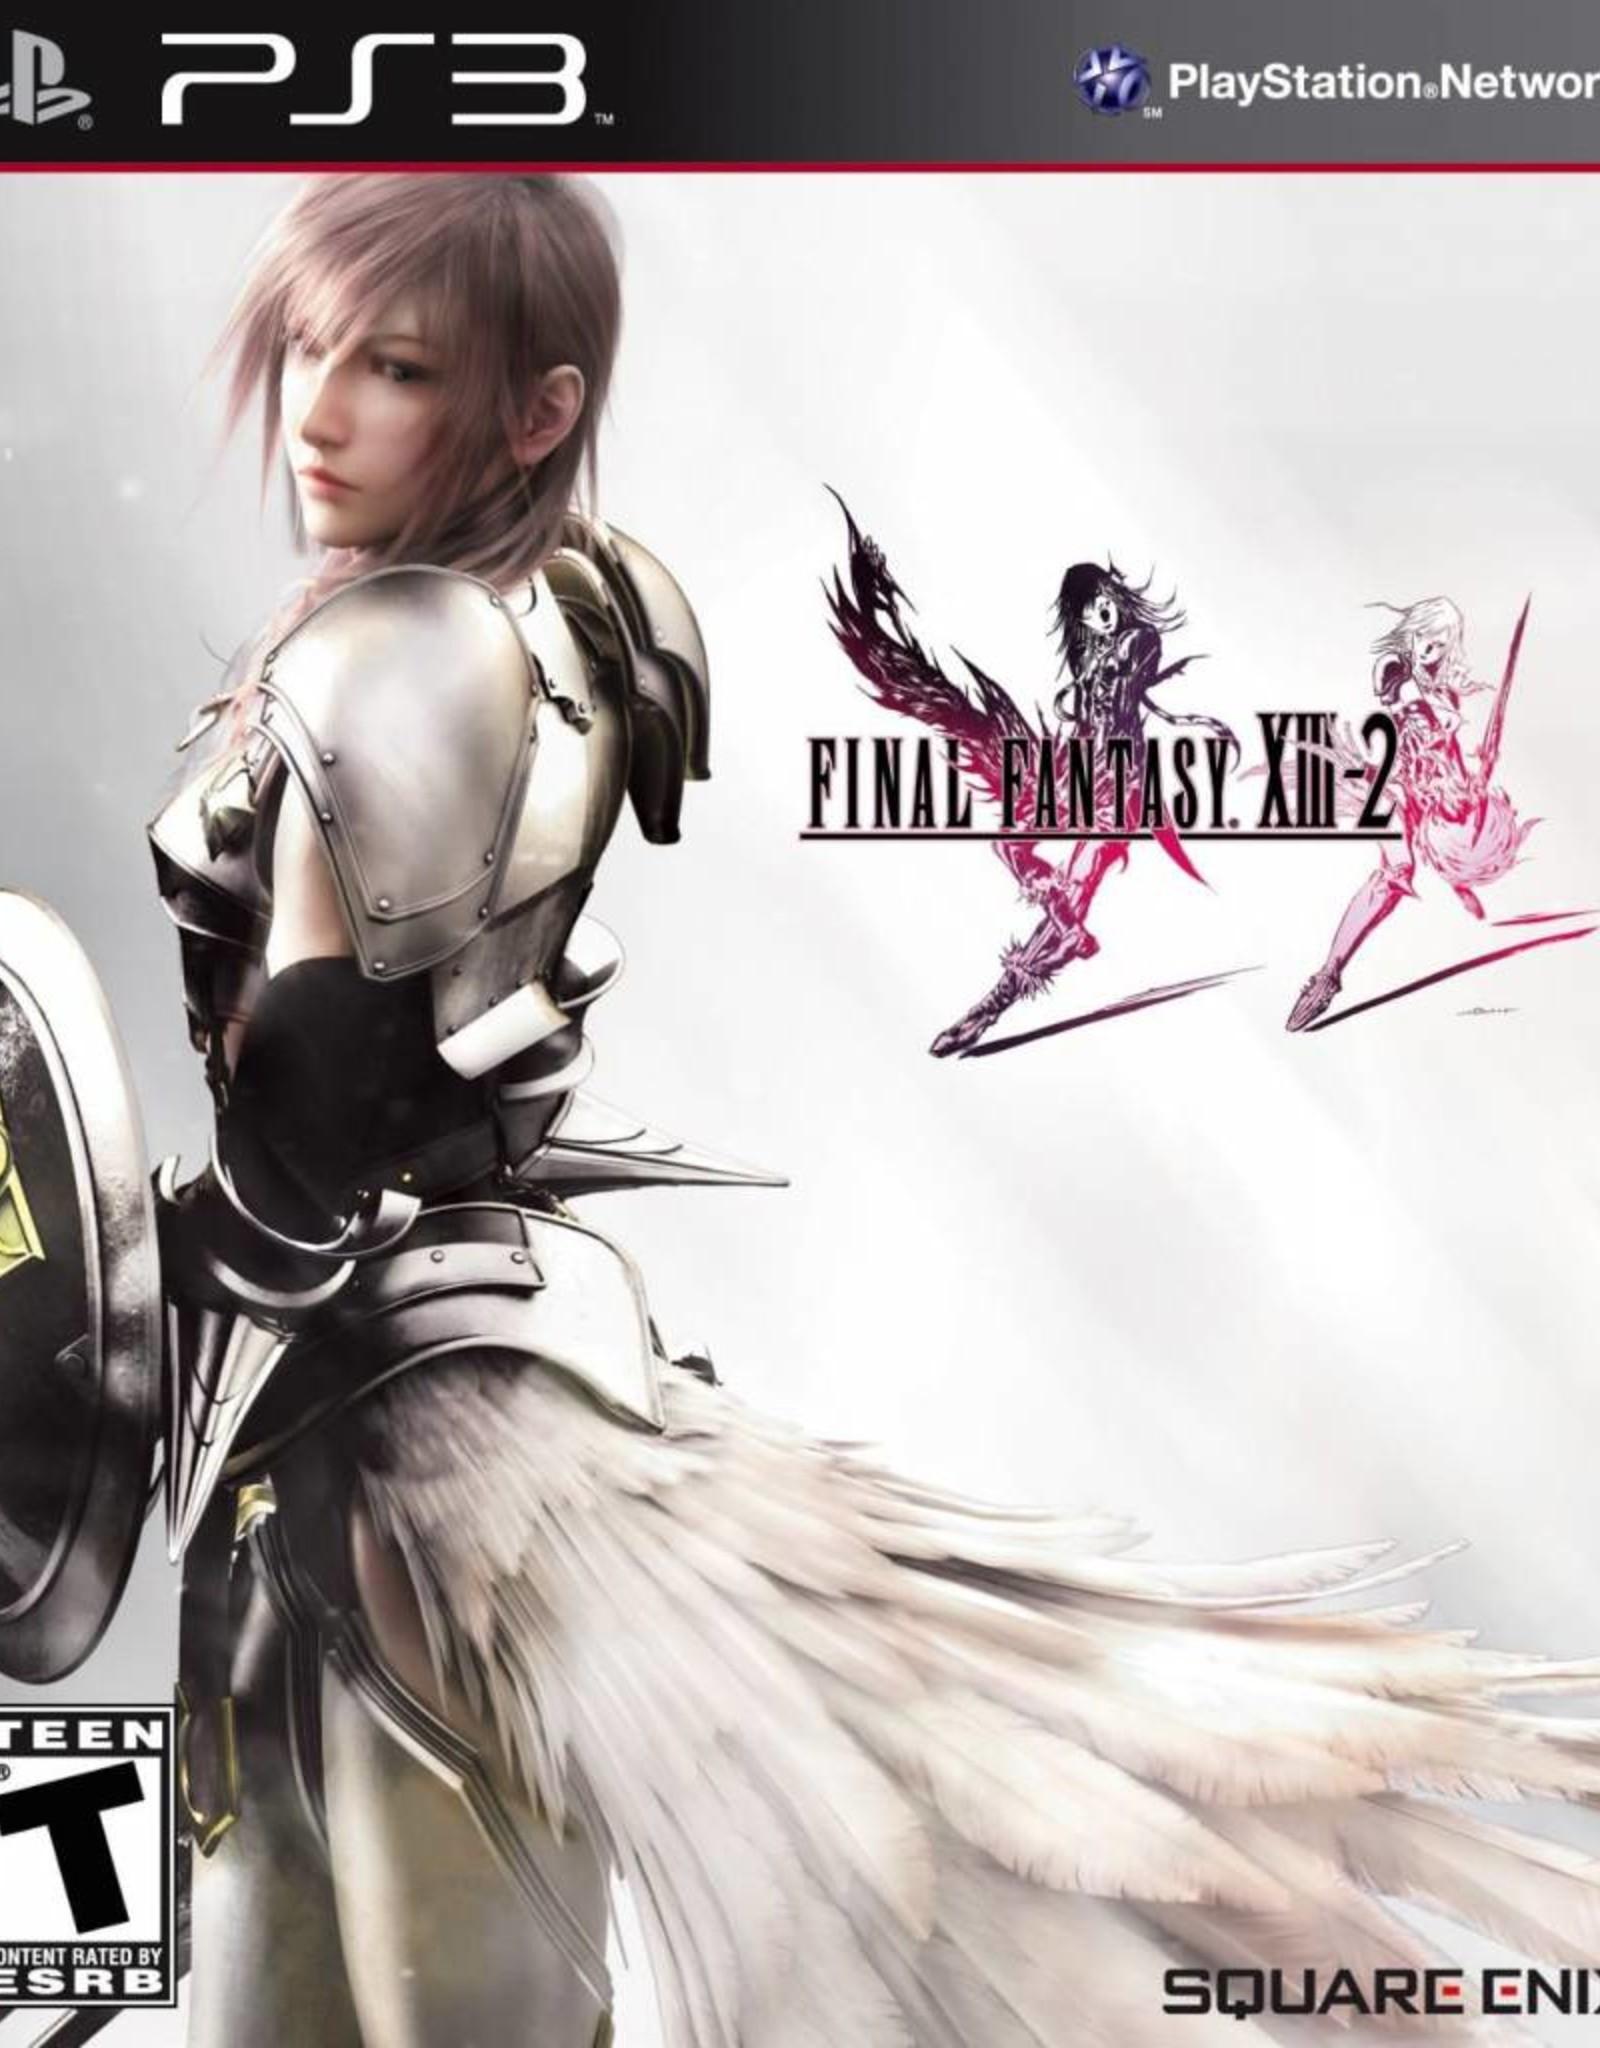 Final Fantasy 13 - 2 - PS3 NEW